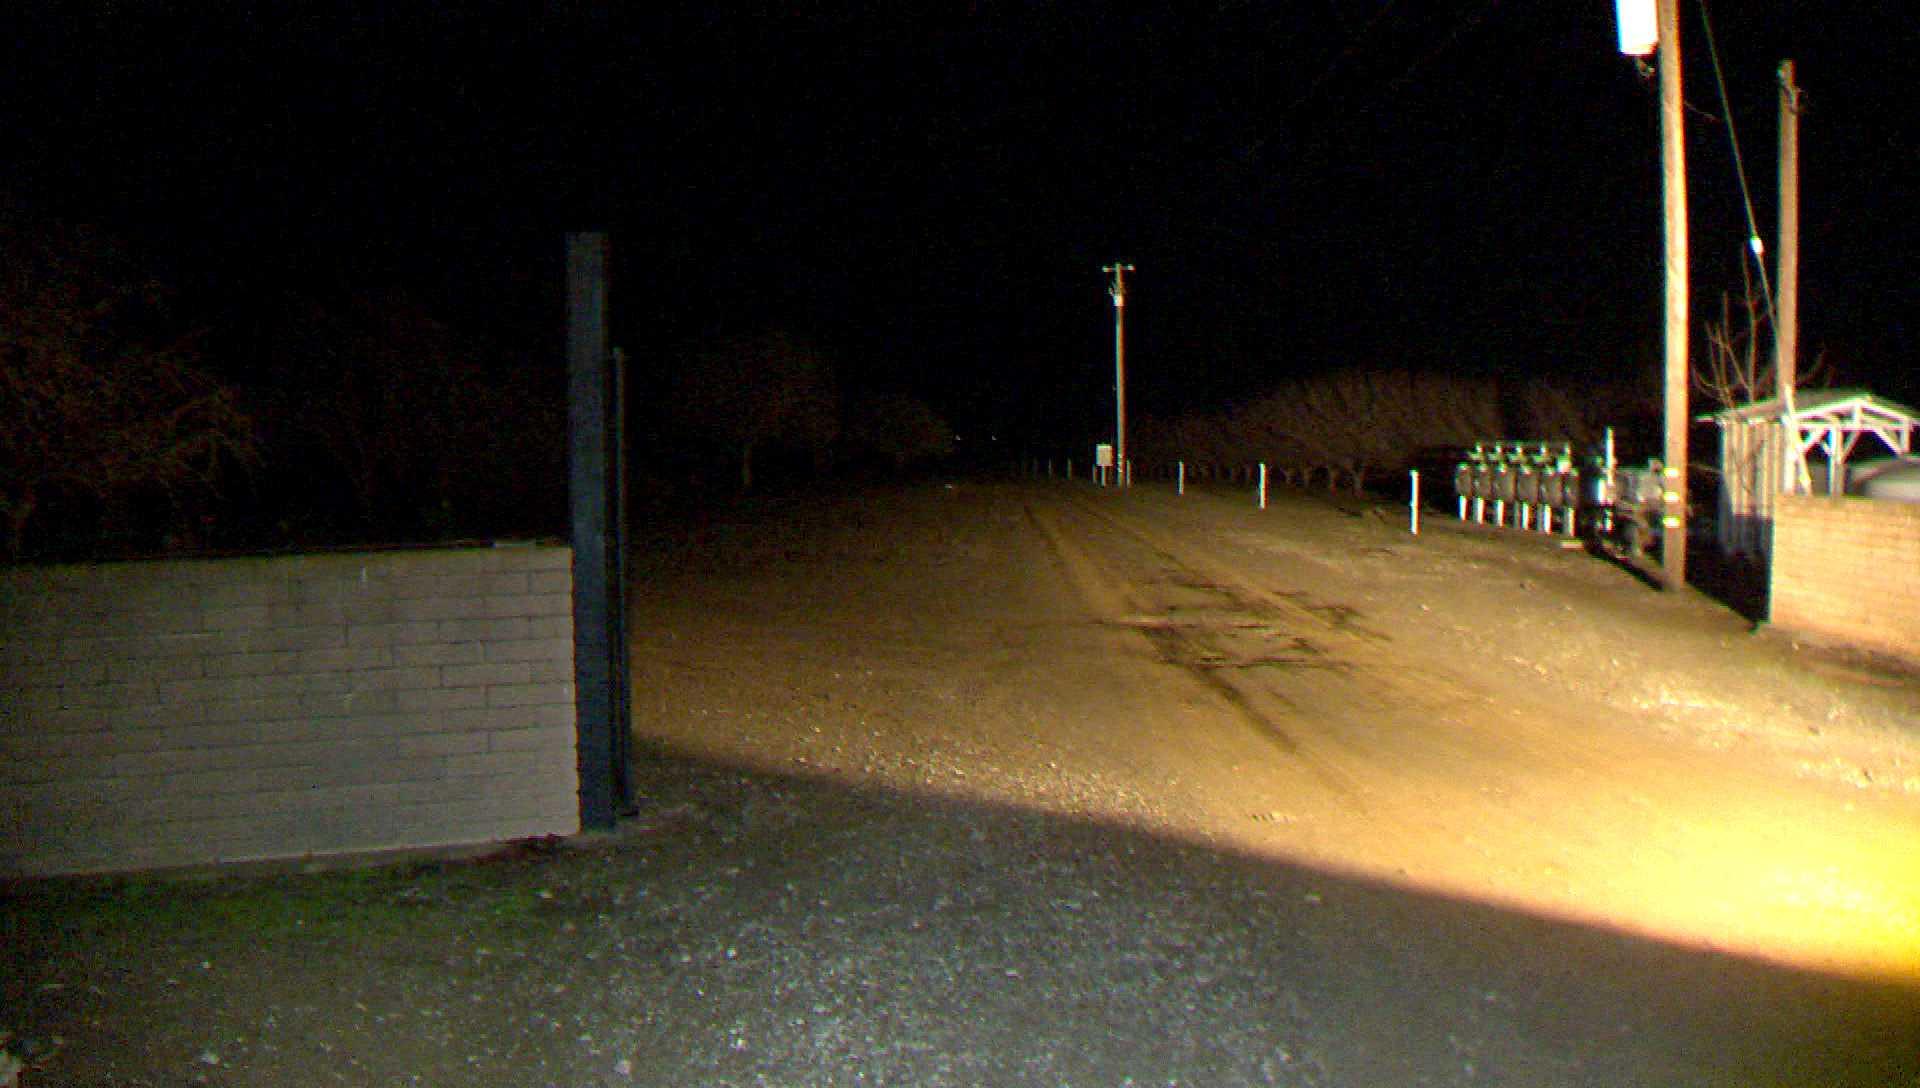 Man arrested after dead women found in freezer, pond